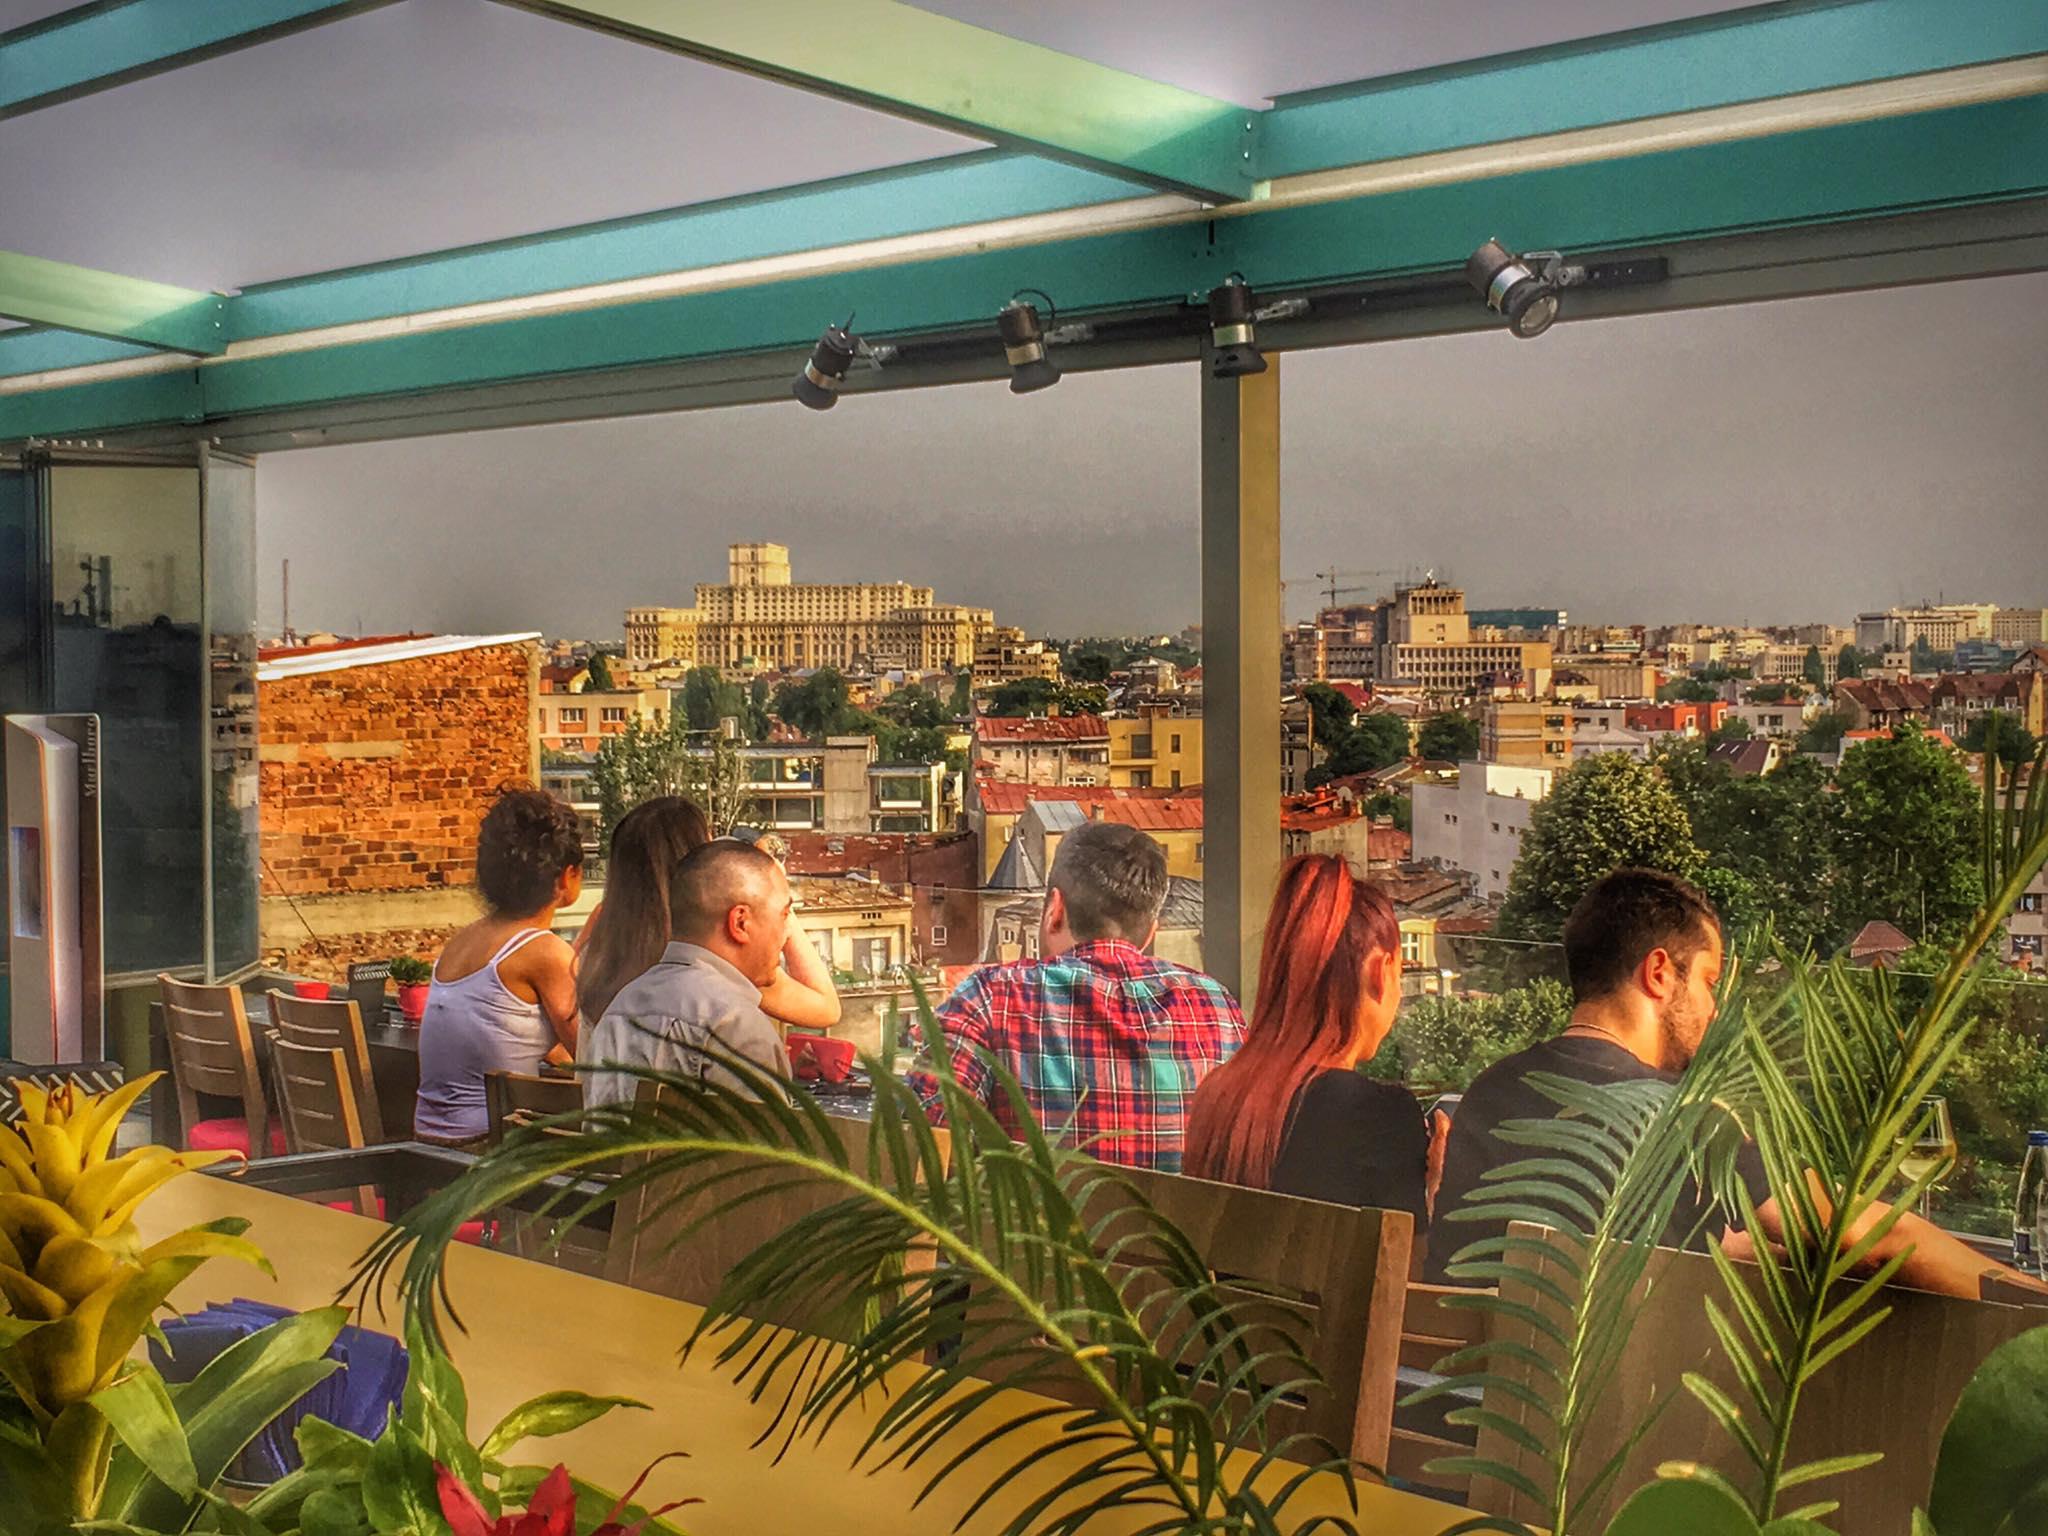 Upstairs Rooftop rooftop-uri pentru vara 2016